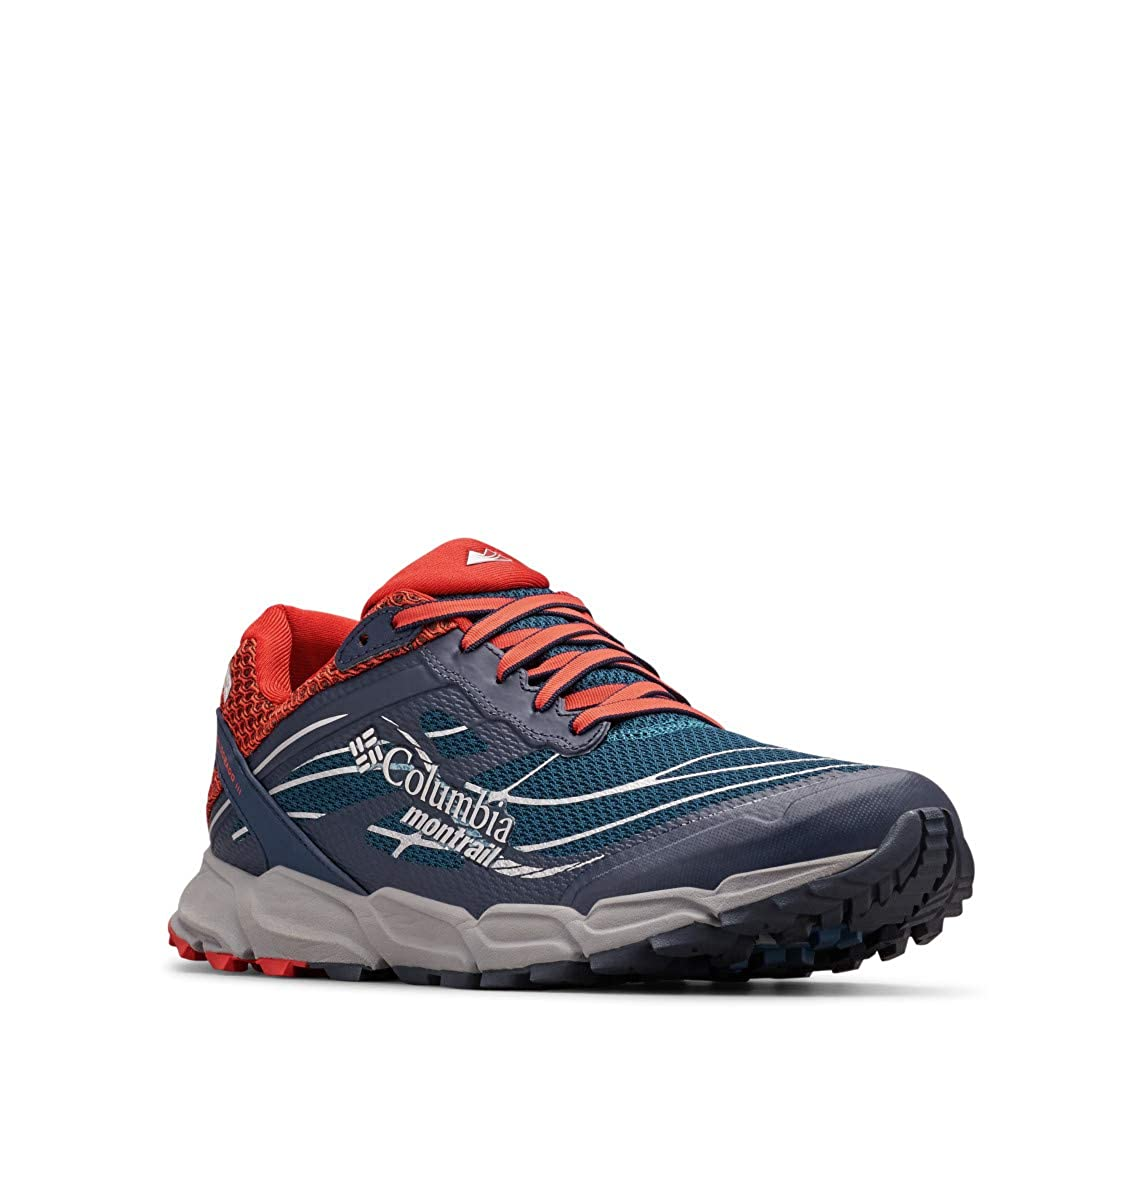 Bleu (Phoenix bleu, Flash 442) 45 EU Columbia Caldorado III Outdry, Chaussures de Trail Homme